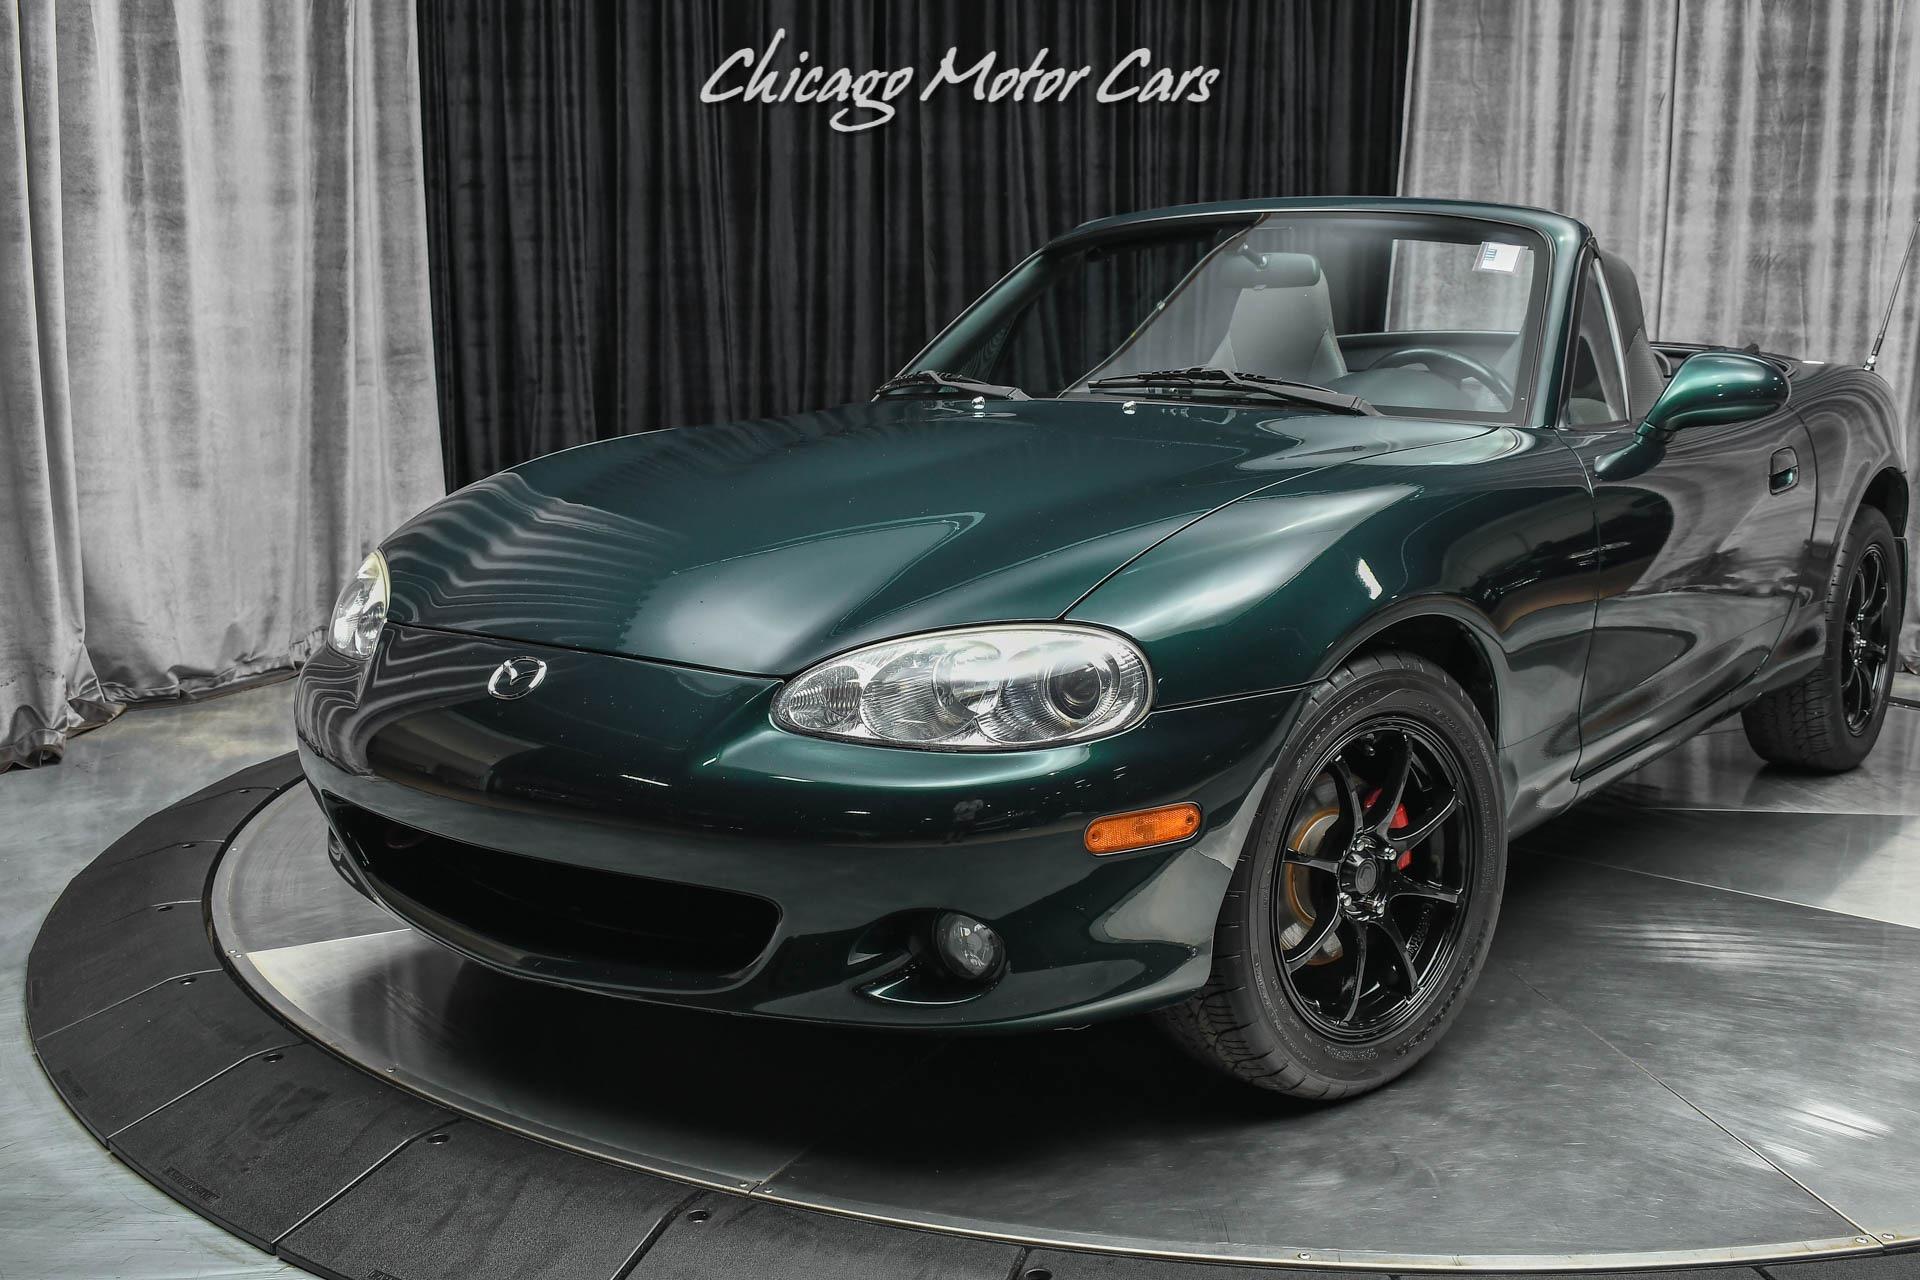 Used-2002-Mazda-MX-5-Miata-LS-5-Speed-Manual-Low-Miles-Serviced-Convertible